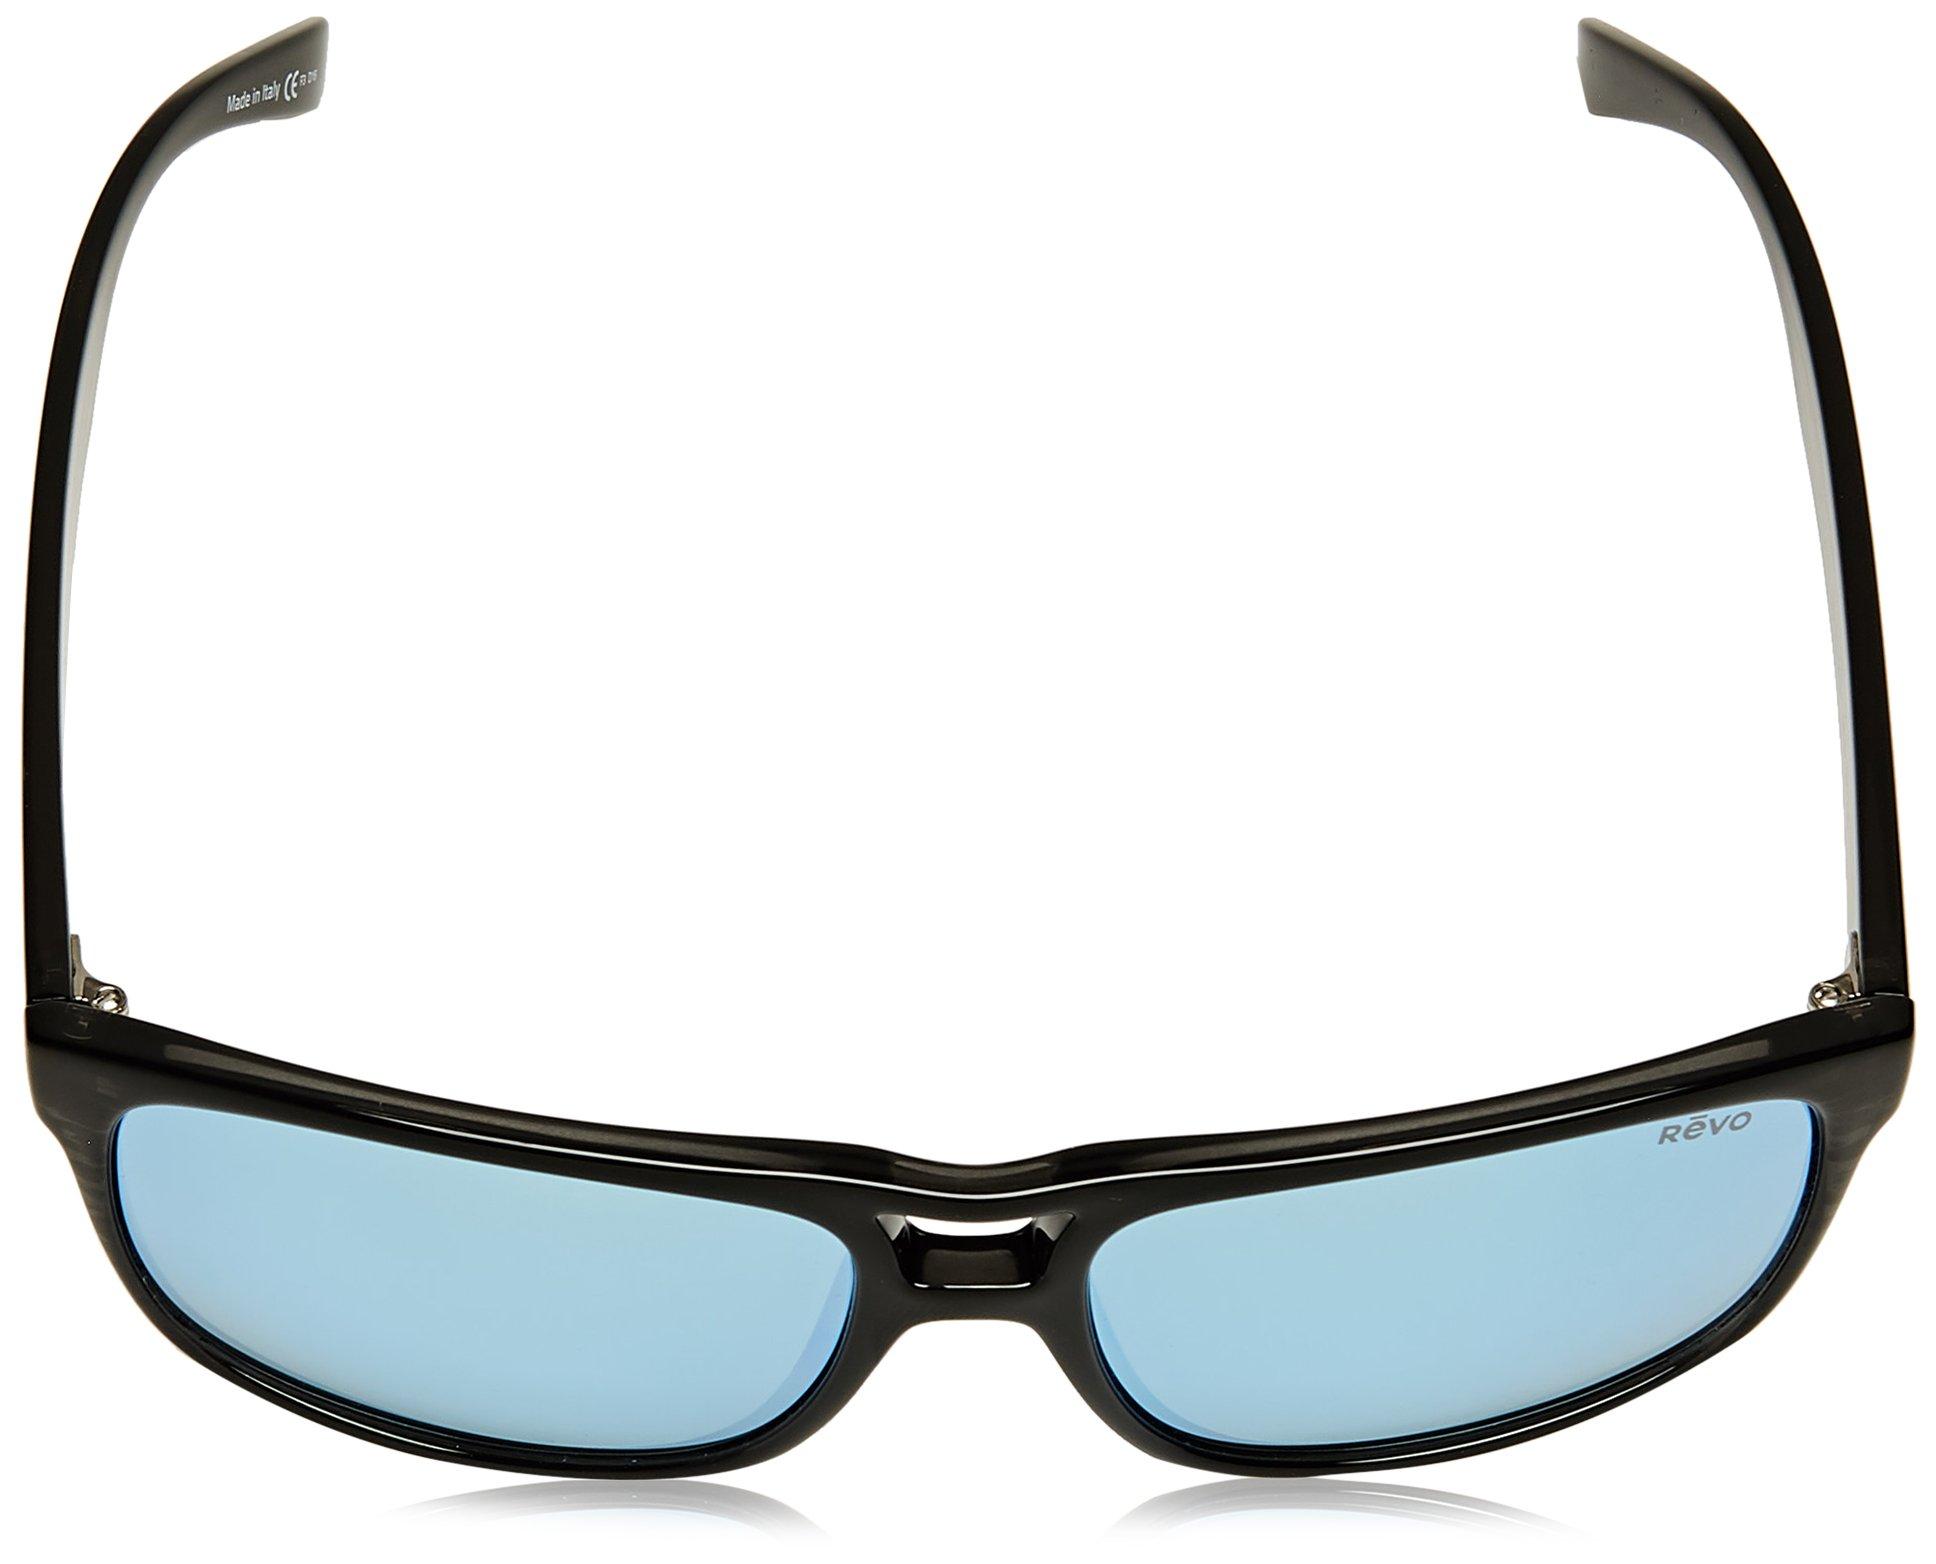 Revo Holsby Style and Performance Polarized Sunglasses, RE1019, Black Woodgrain, 58 mm by Revo Sunglasses (Image #4)